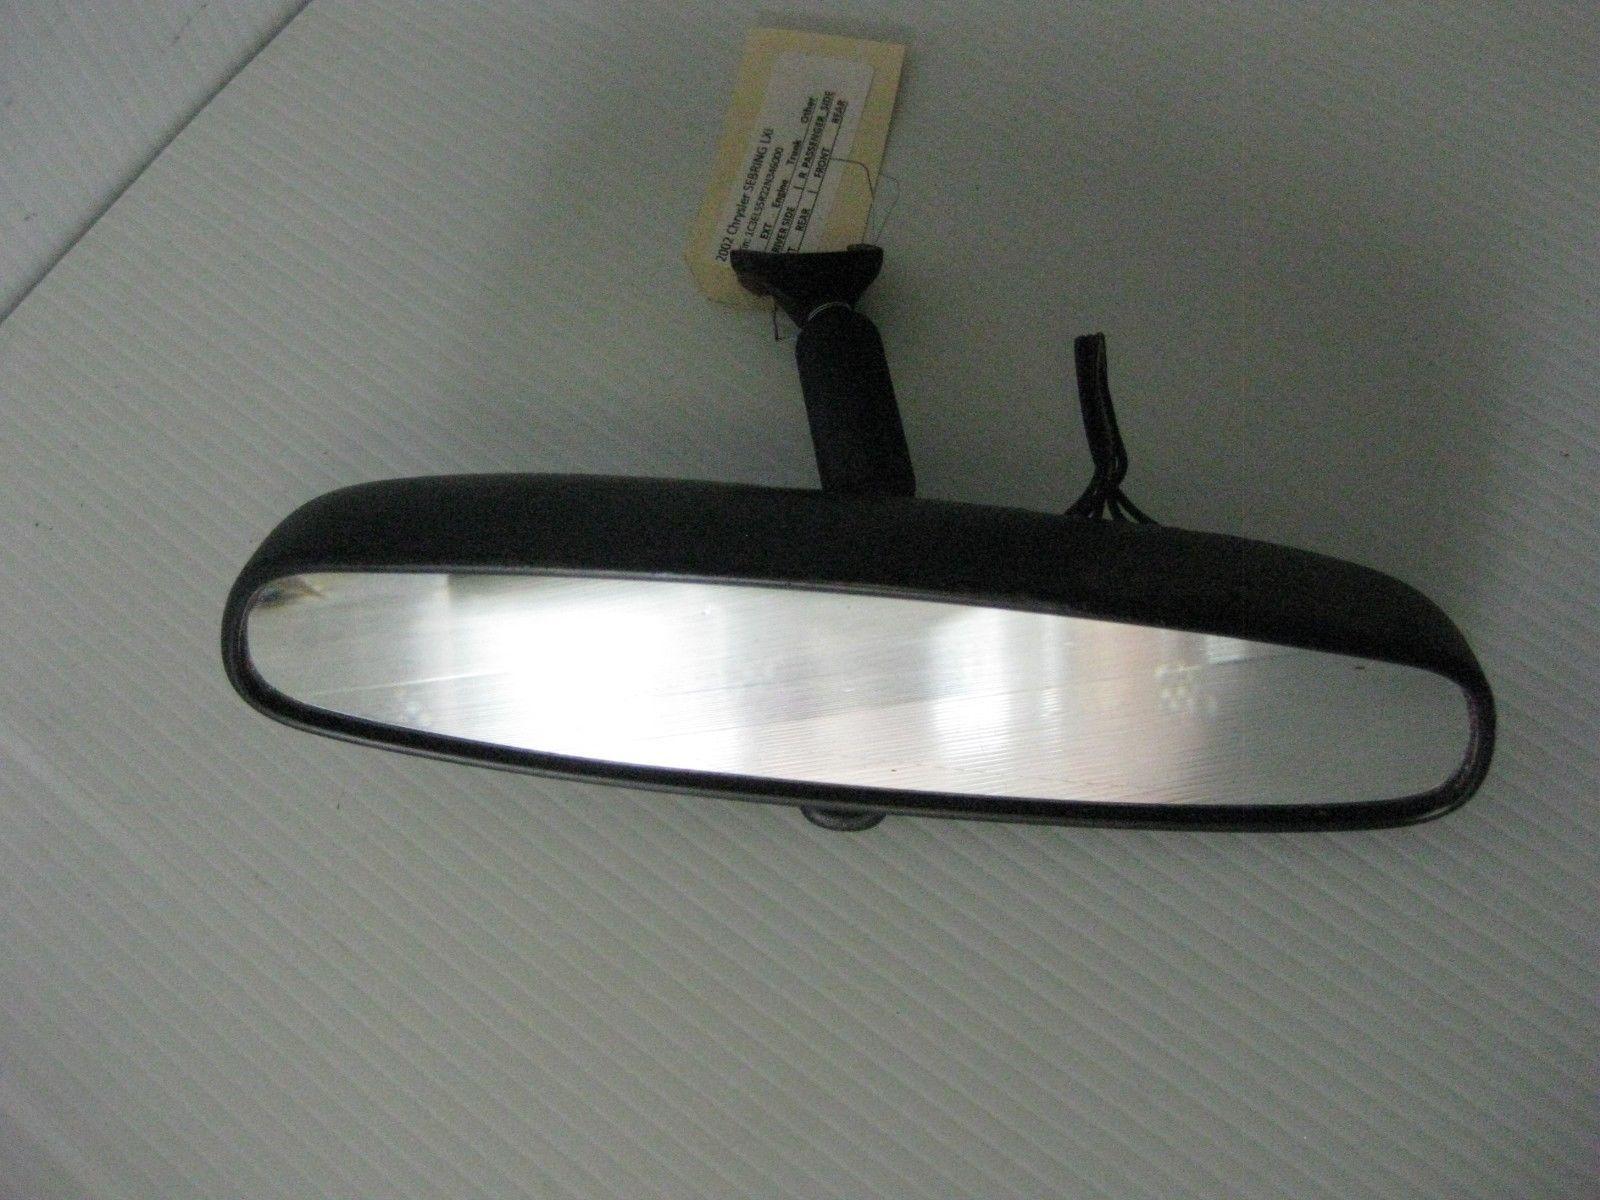 Chrysler Sebring Lxi 2002 Rear View Mirror And 35 Similar Items S L1600